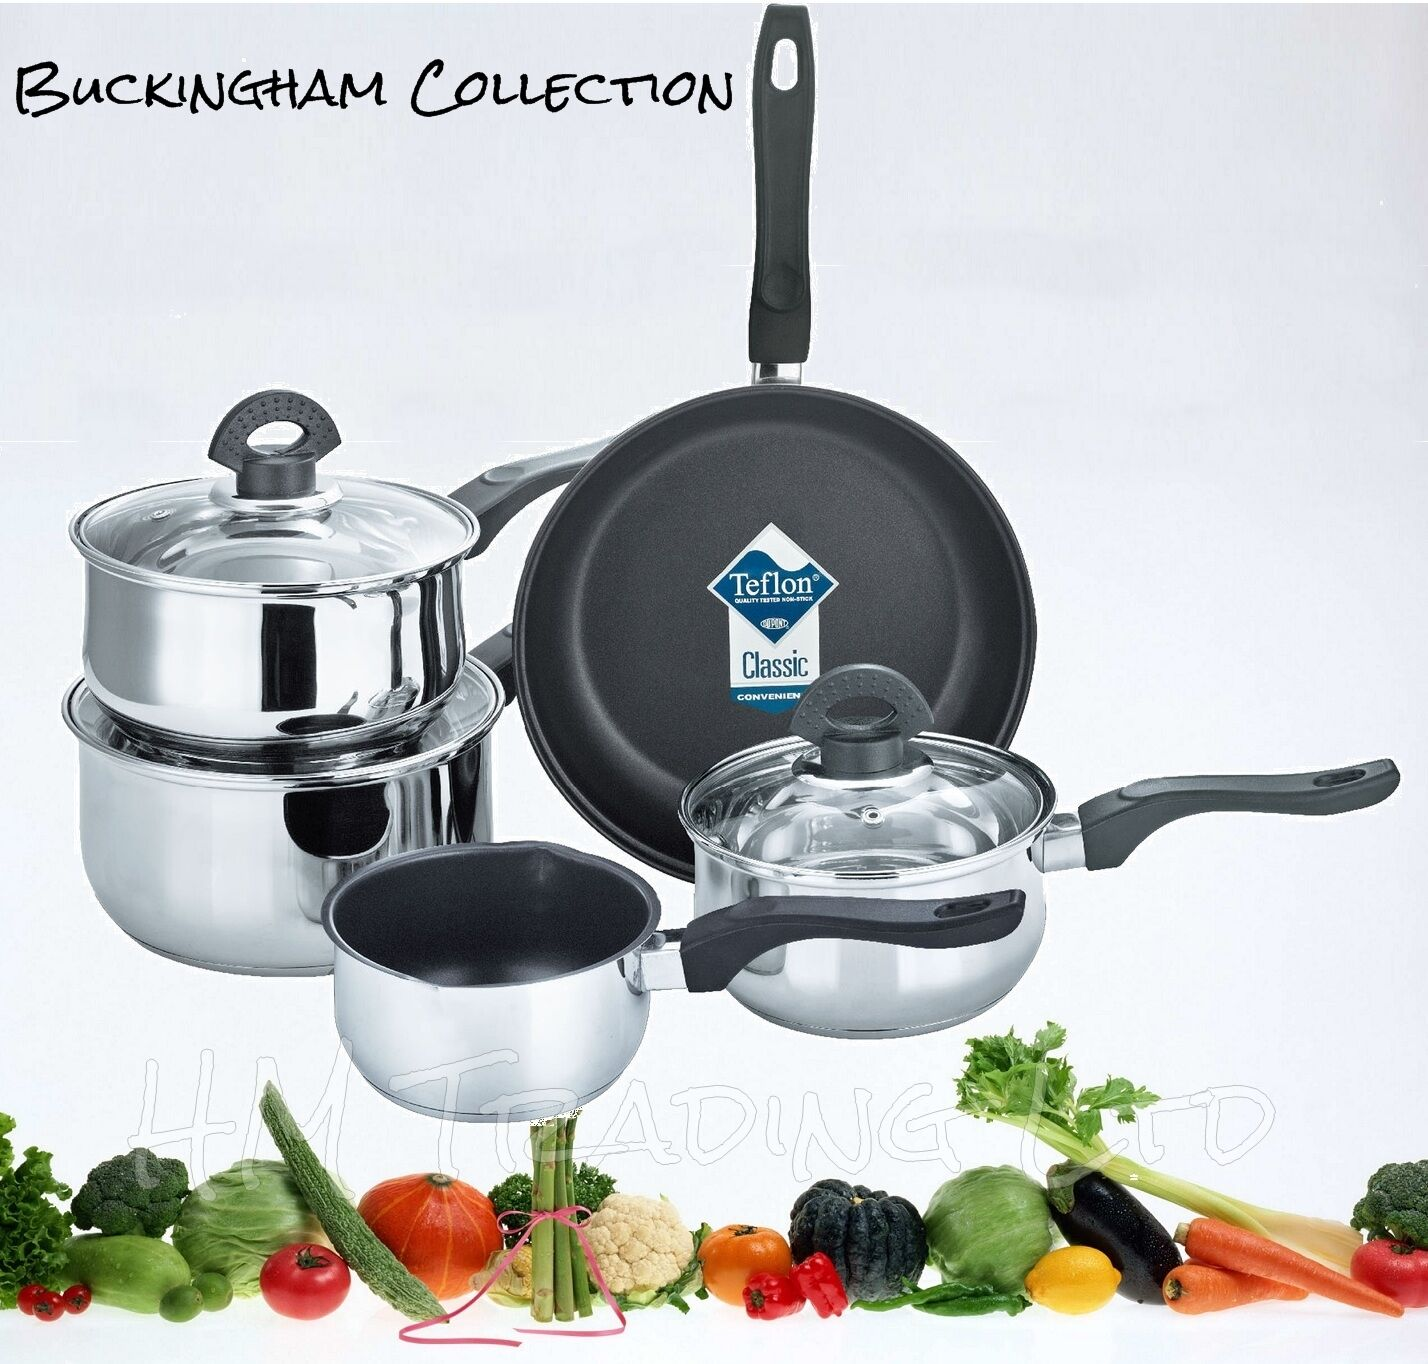 induction saucepan non stick frying pan casserole. Black Bedroom Furniture Sets. Home Design Ideas